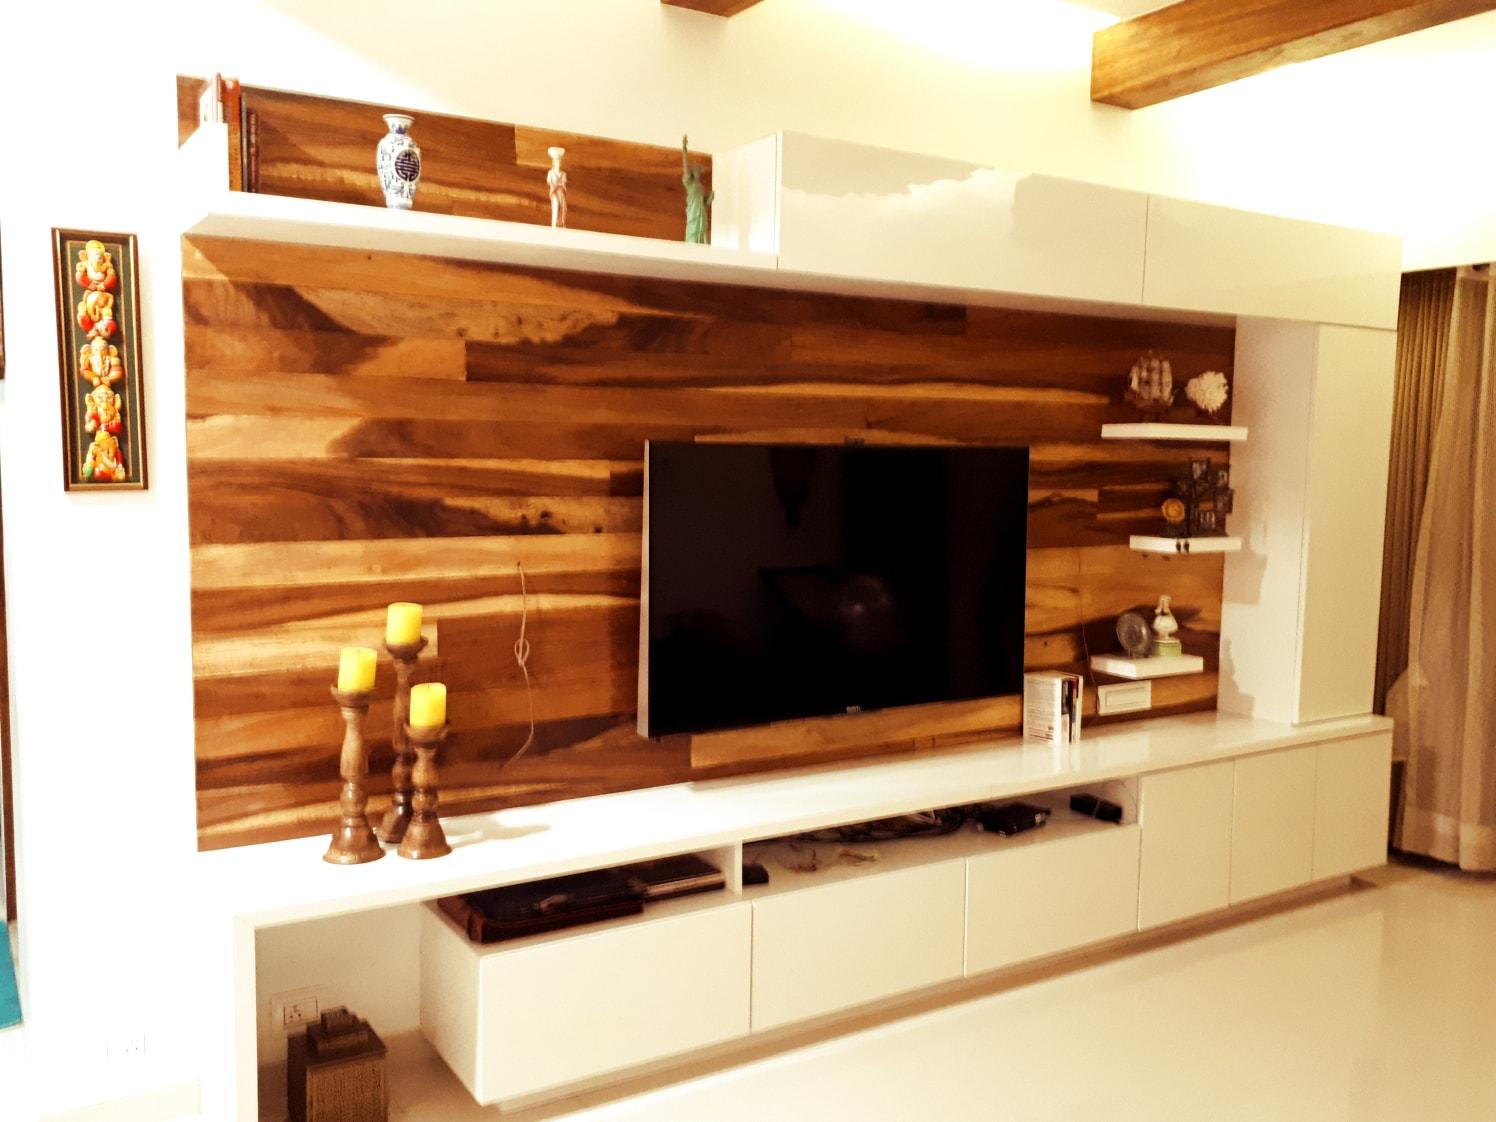 Living Room With Wooden Interiors by Gunjan Mehrotra Living-room Modern | Interior Design Photos & Ideas